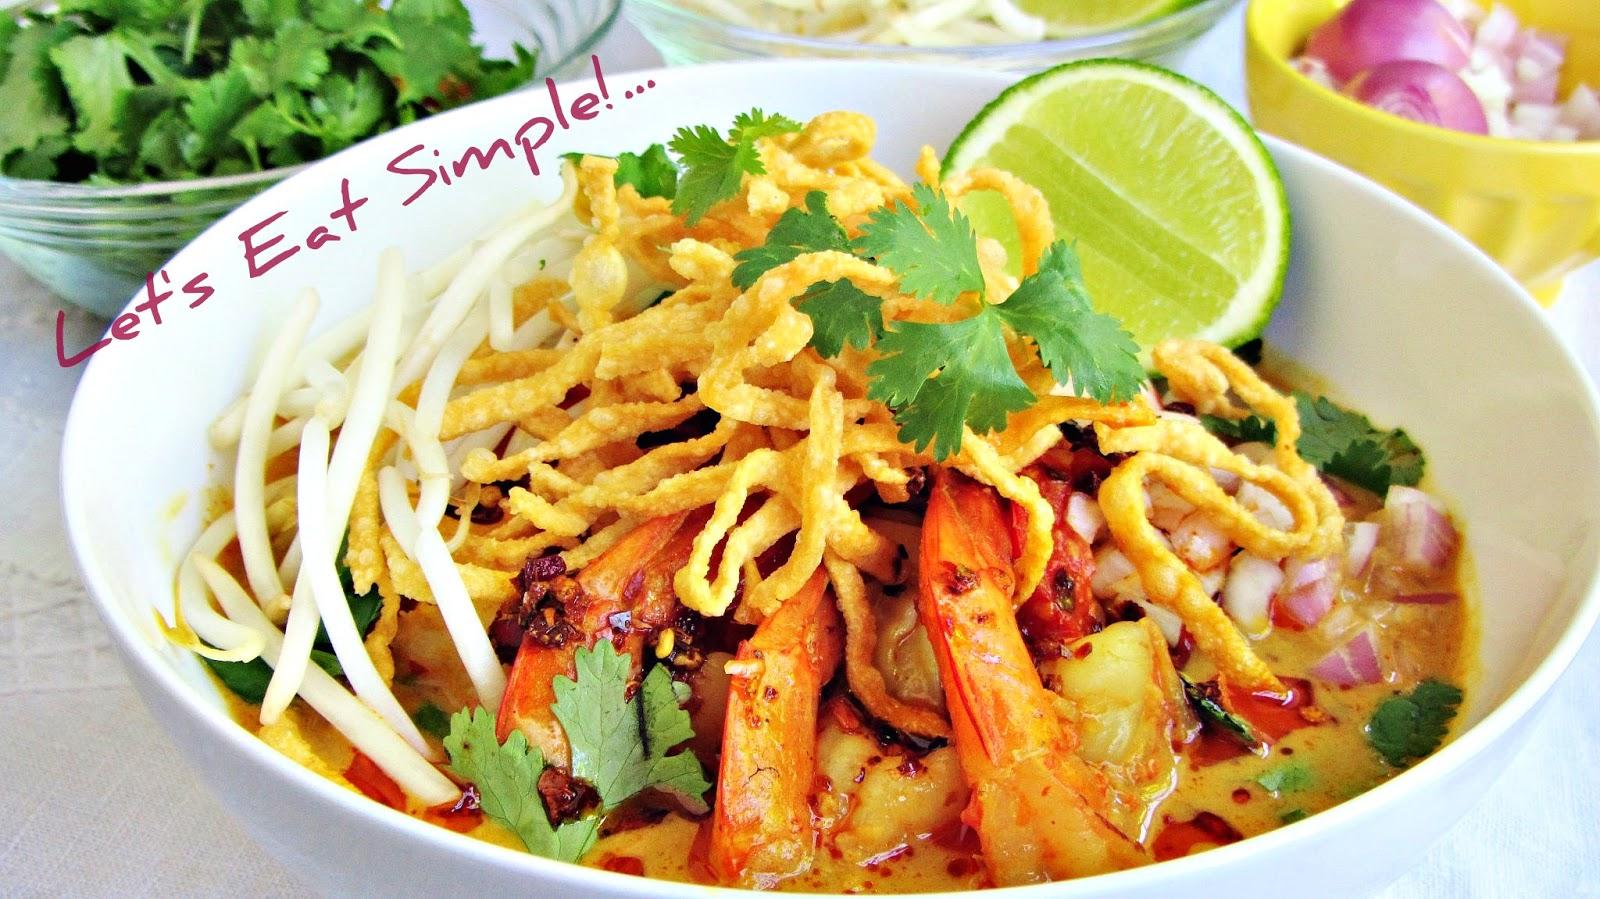 ... eat.....simple!: Khao Soi Goong / Northern-Thai Shrimp Curry Noodle